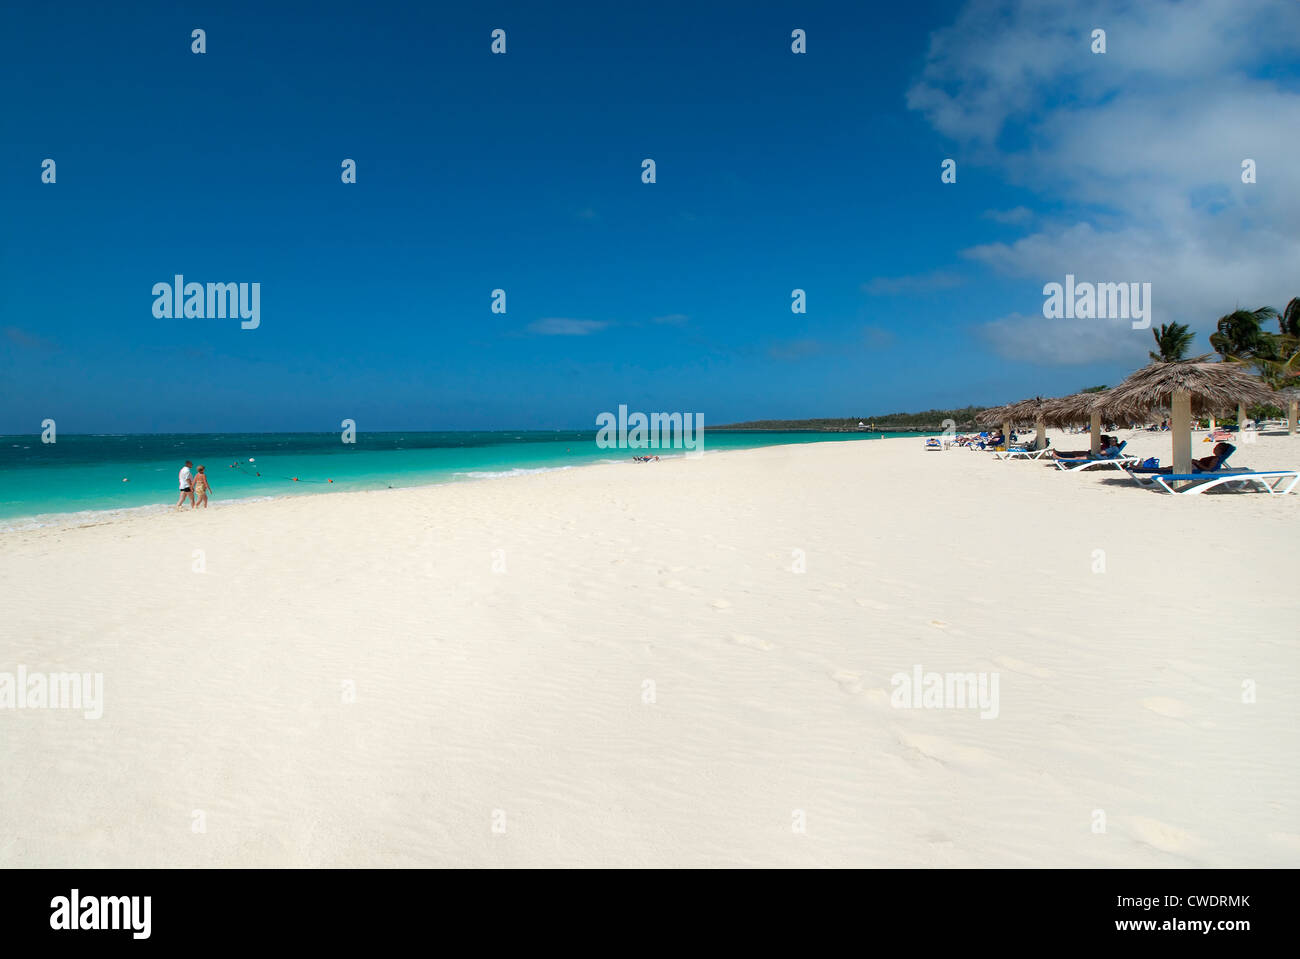 Strand in der Nähe von Hotel Sol Rio de Luna & Stuten, Guardalavaca, Holguin, Kuba Stockbild